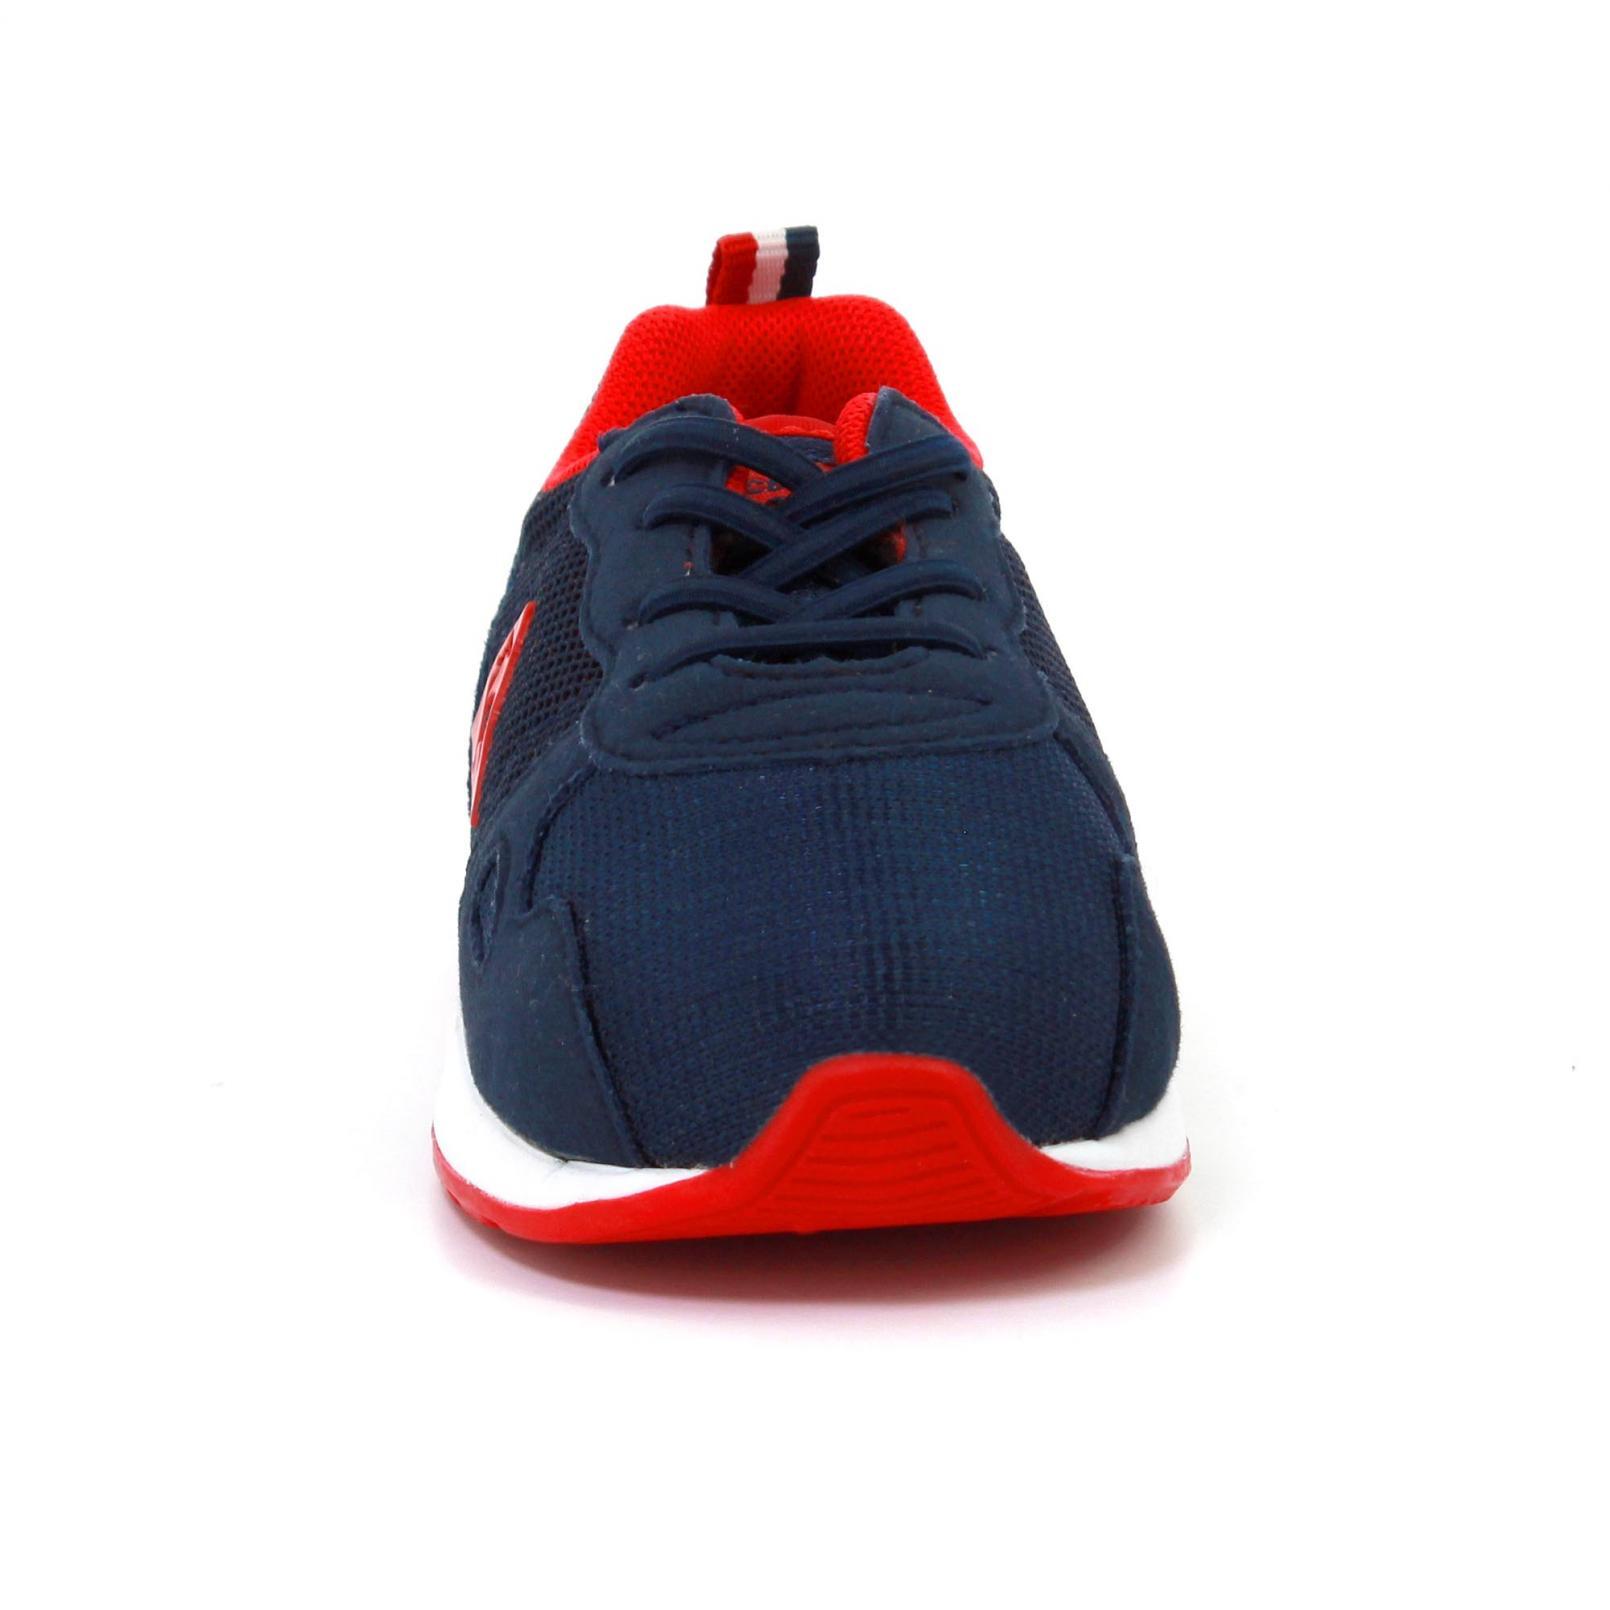 Shoes – Le Coq Sportif Lcs R600 Inf 3D Mesh Blue/Red